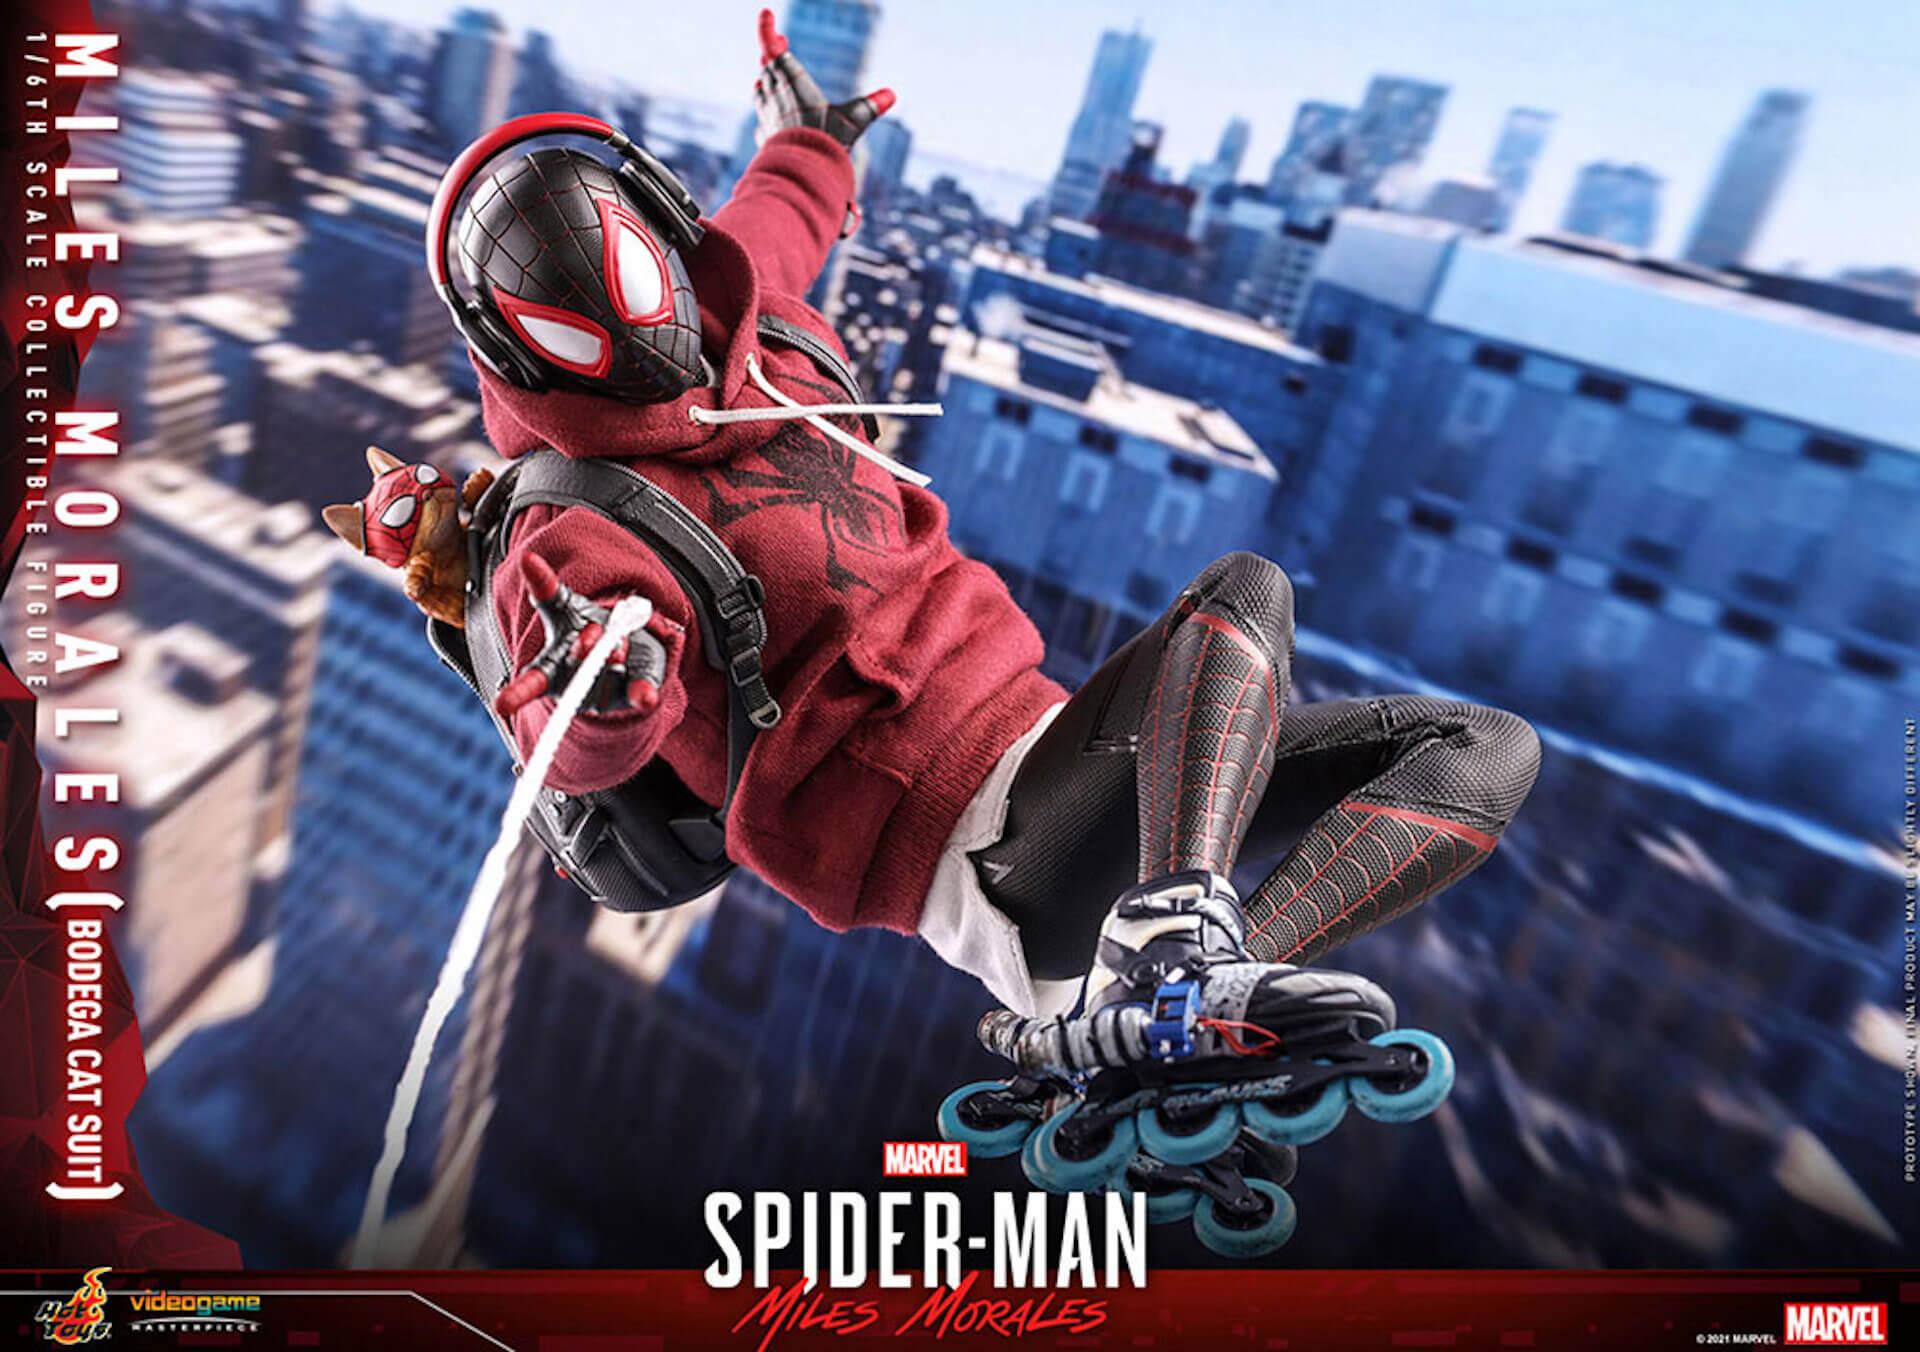 『Marvel's Spider-Man:Miles Morales』のスパイダーマンがホットトイズで超精巧なフィギュアになって登場! art210601_spiderman_hottoys_9